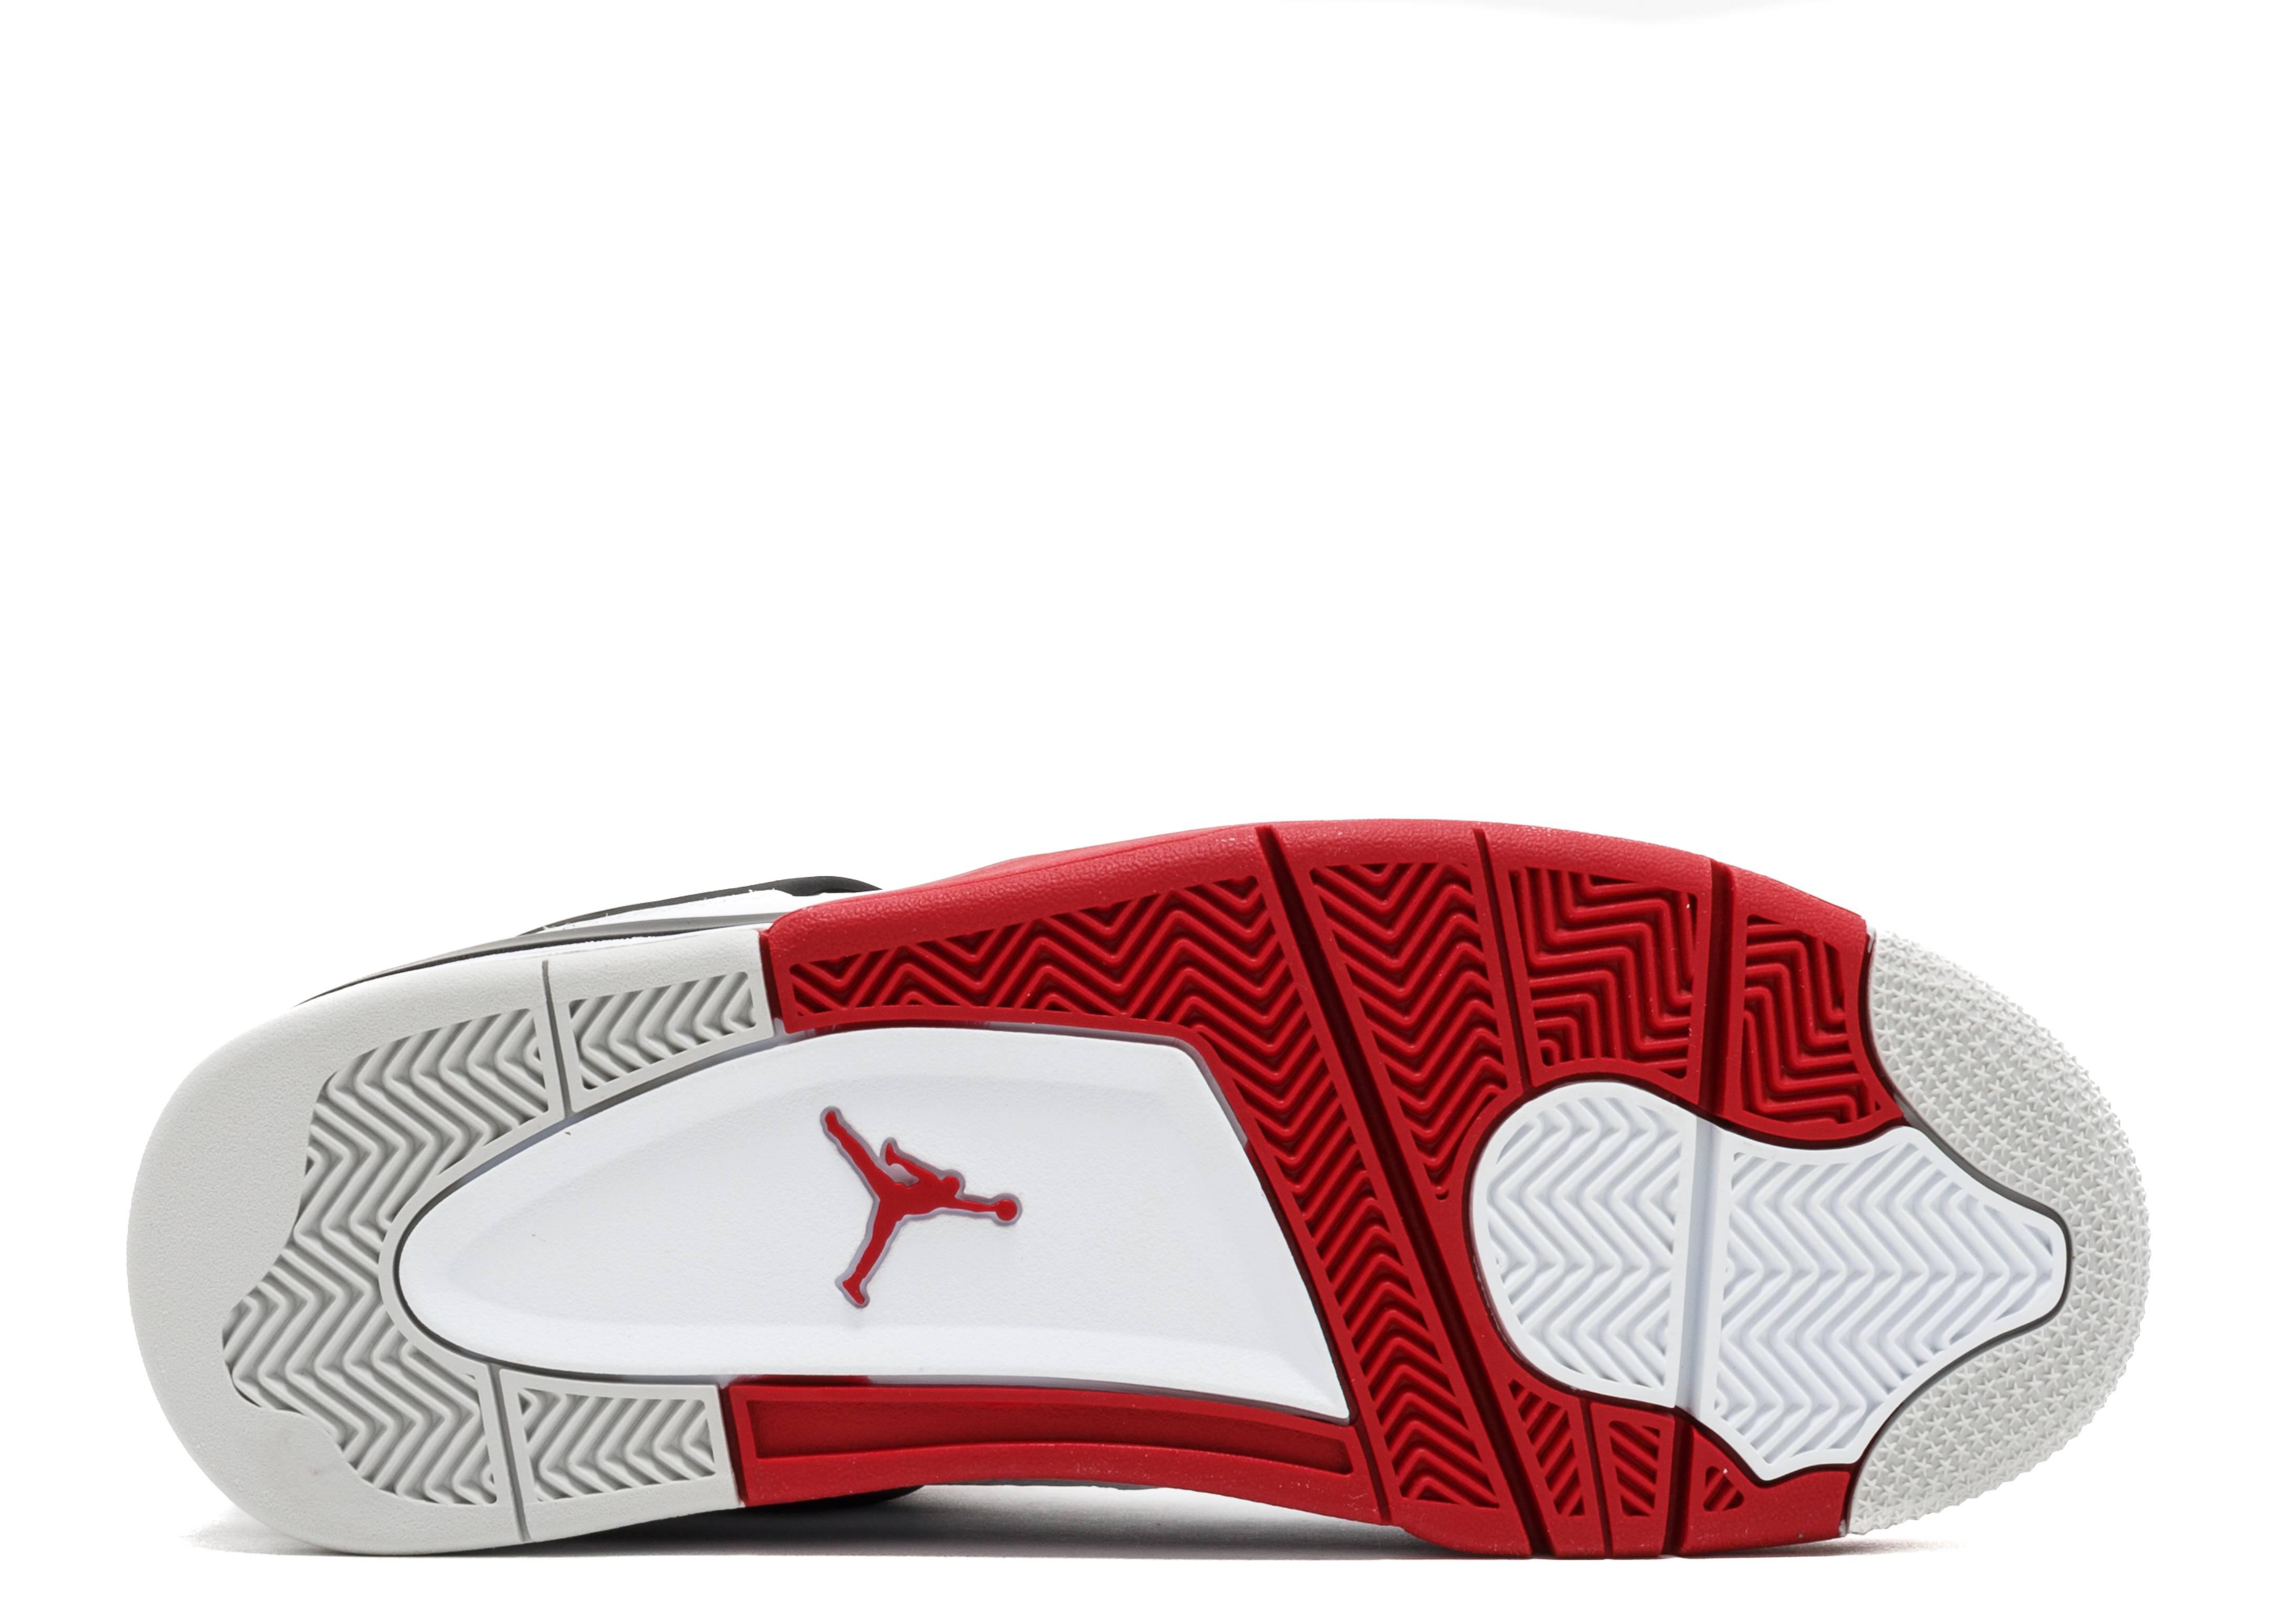 air jordan 4 retro white red